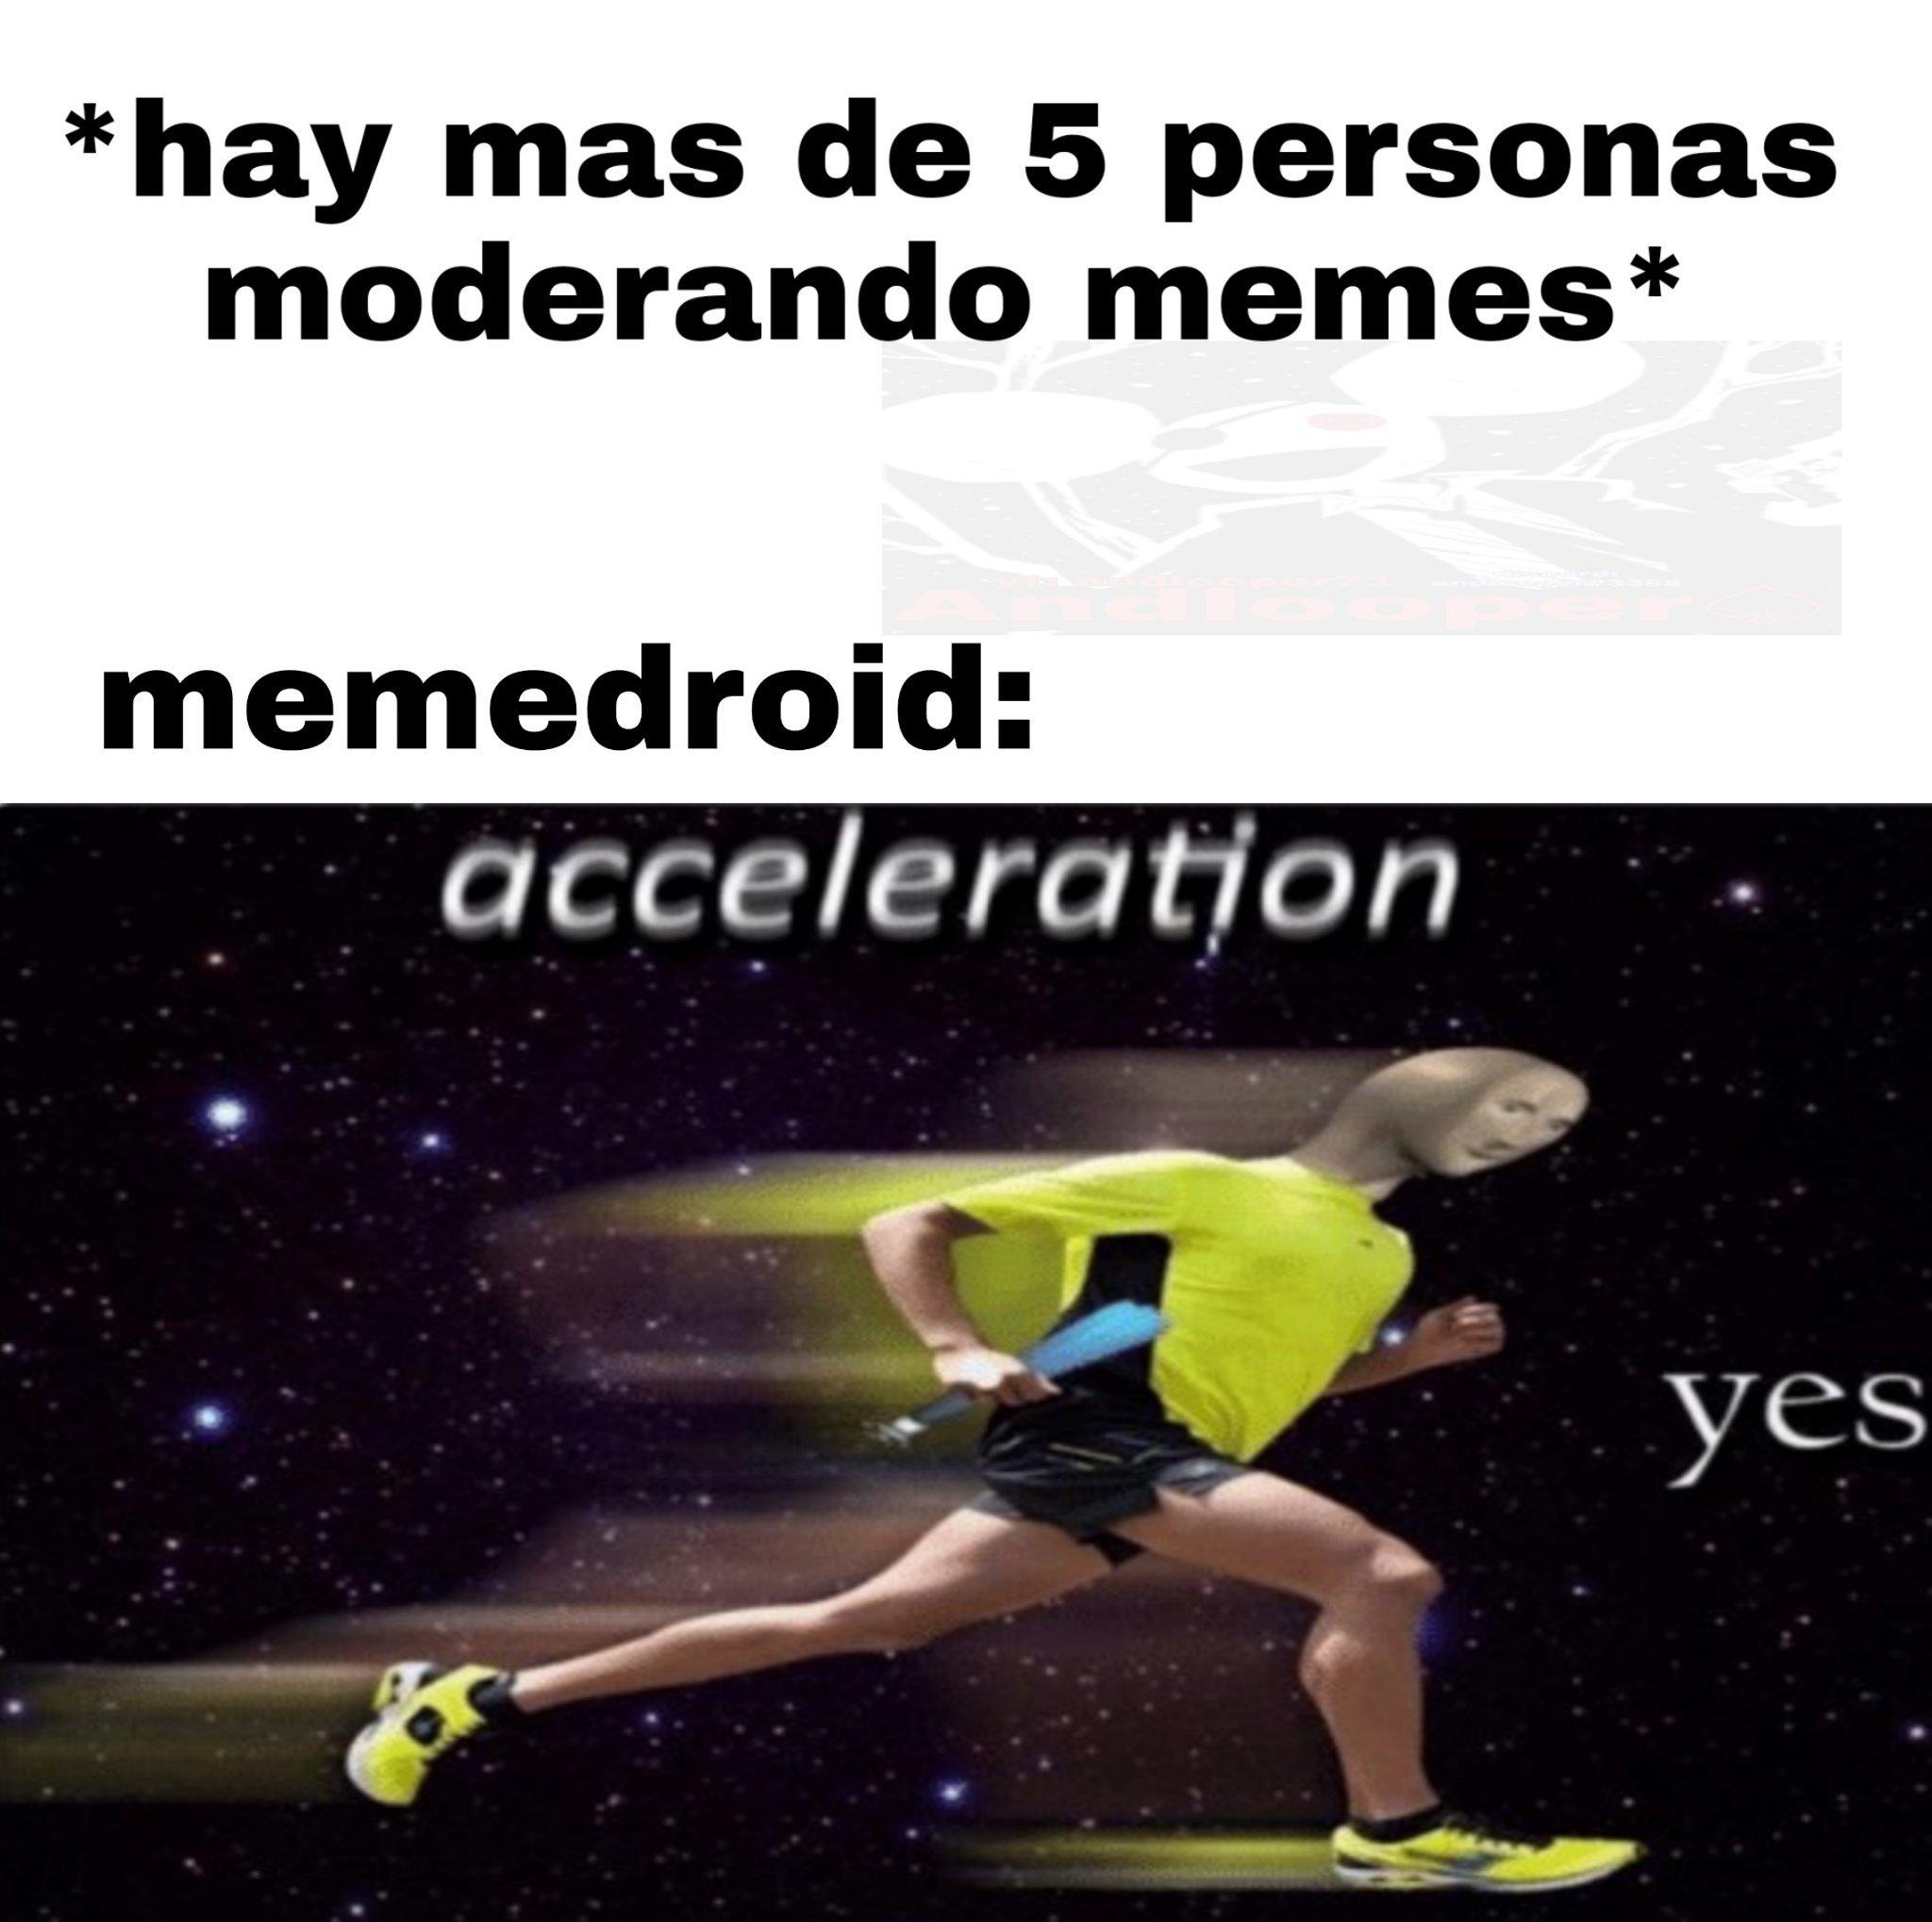 [Titulo] - meme